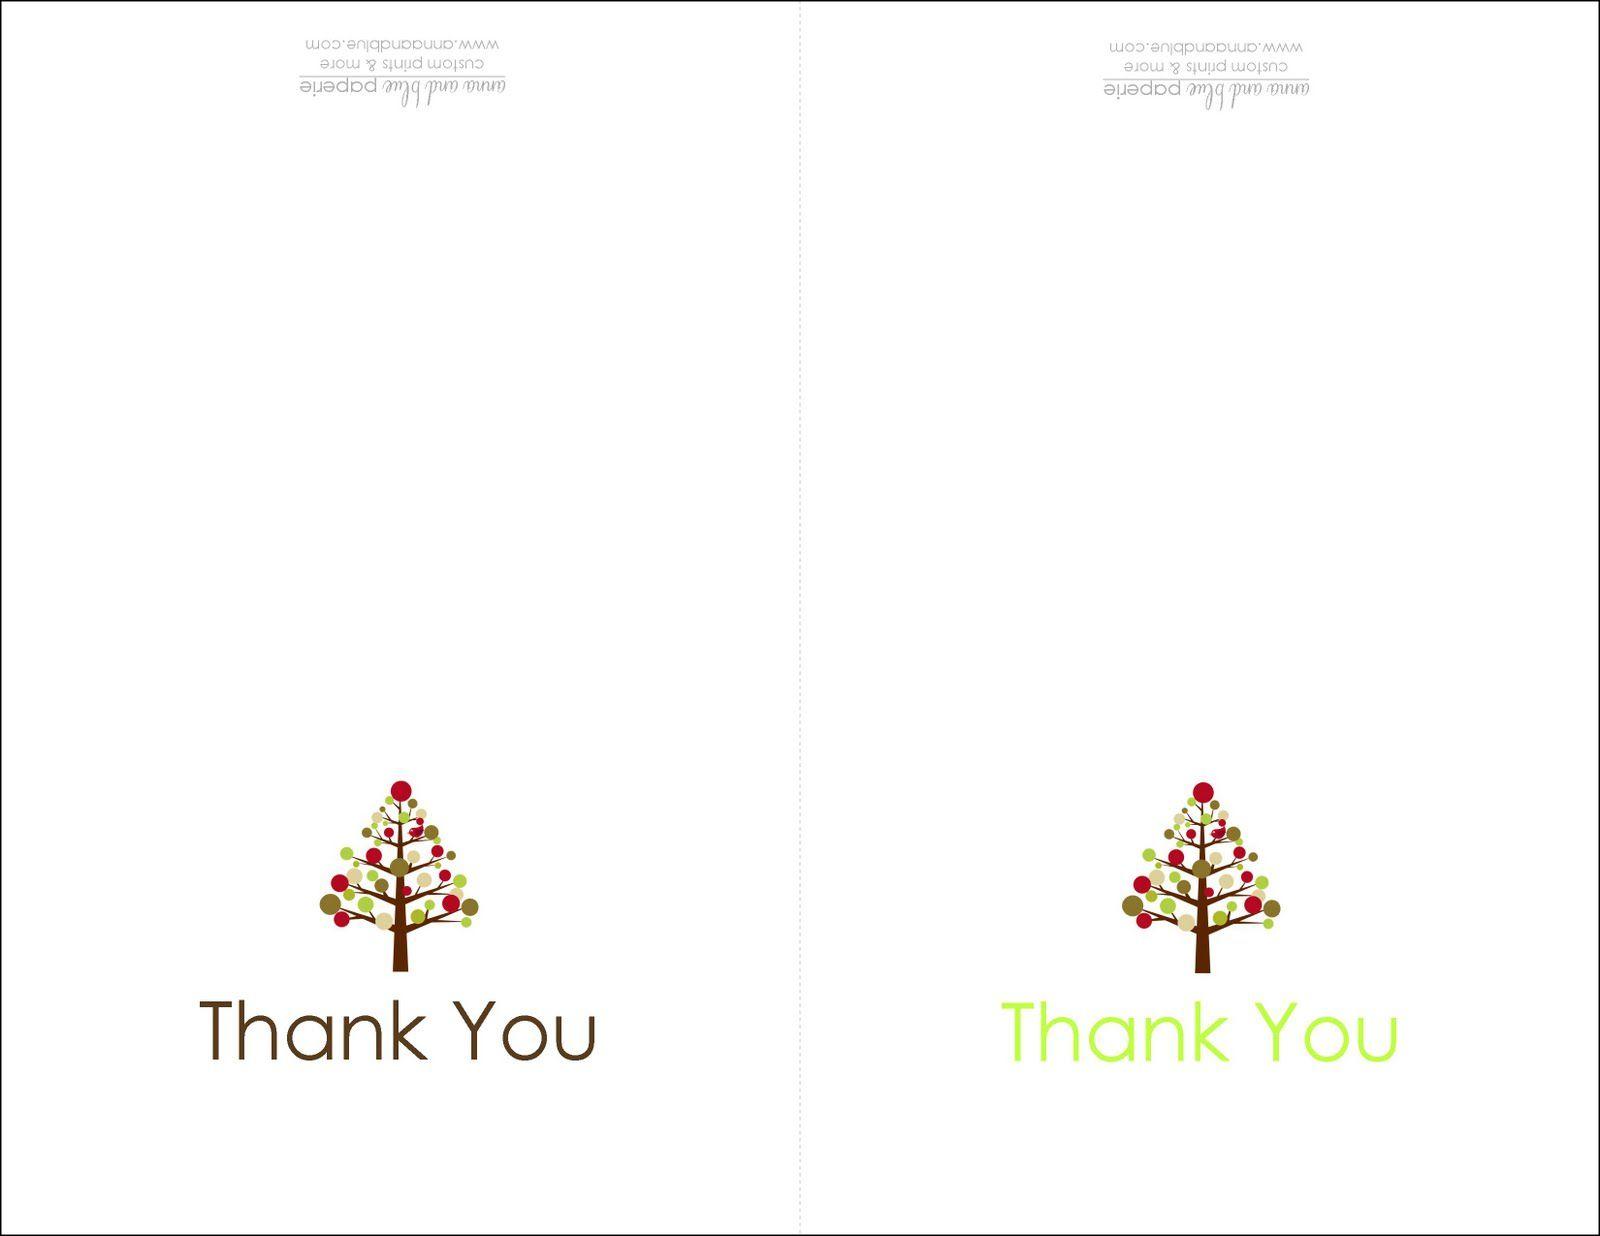 Thank You Cards Printable   Printable   Free Printable Christmas - Christmas Thank You Cards Printable Free